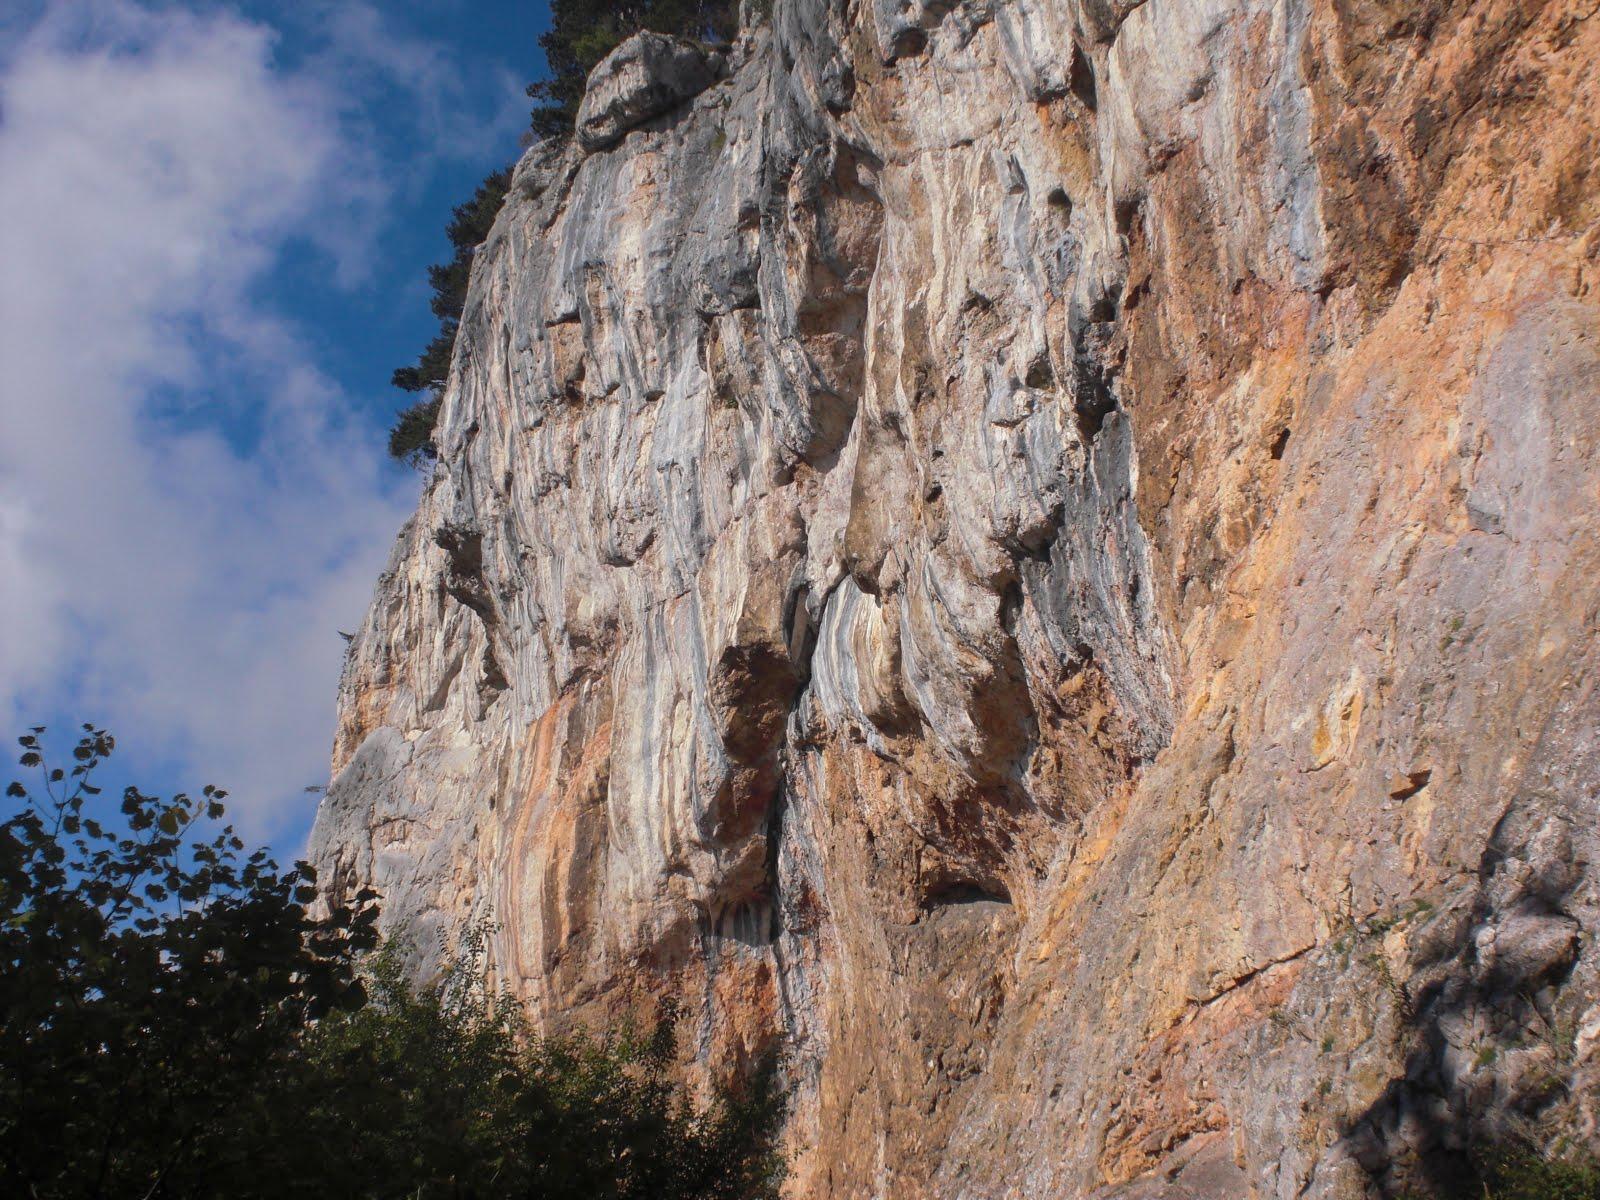 Hohe Wand Klettersteig : Hohe wand norbert schluga klettersteig picture